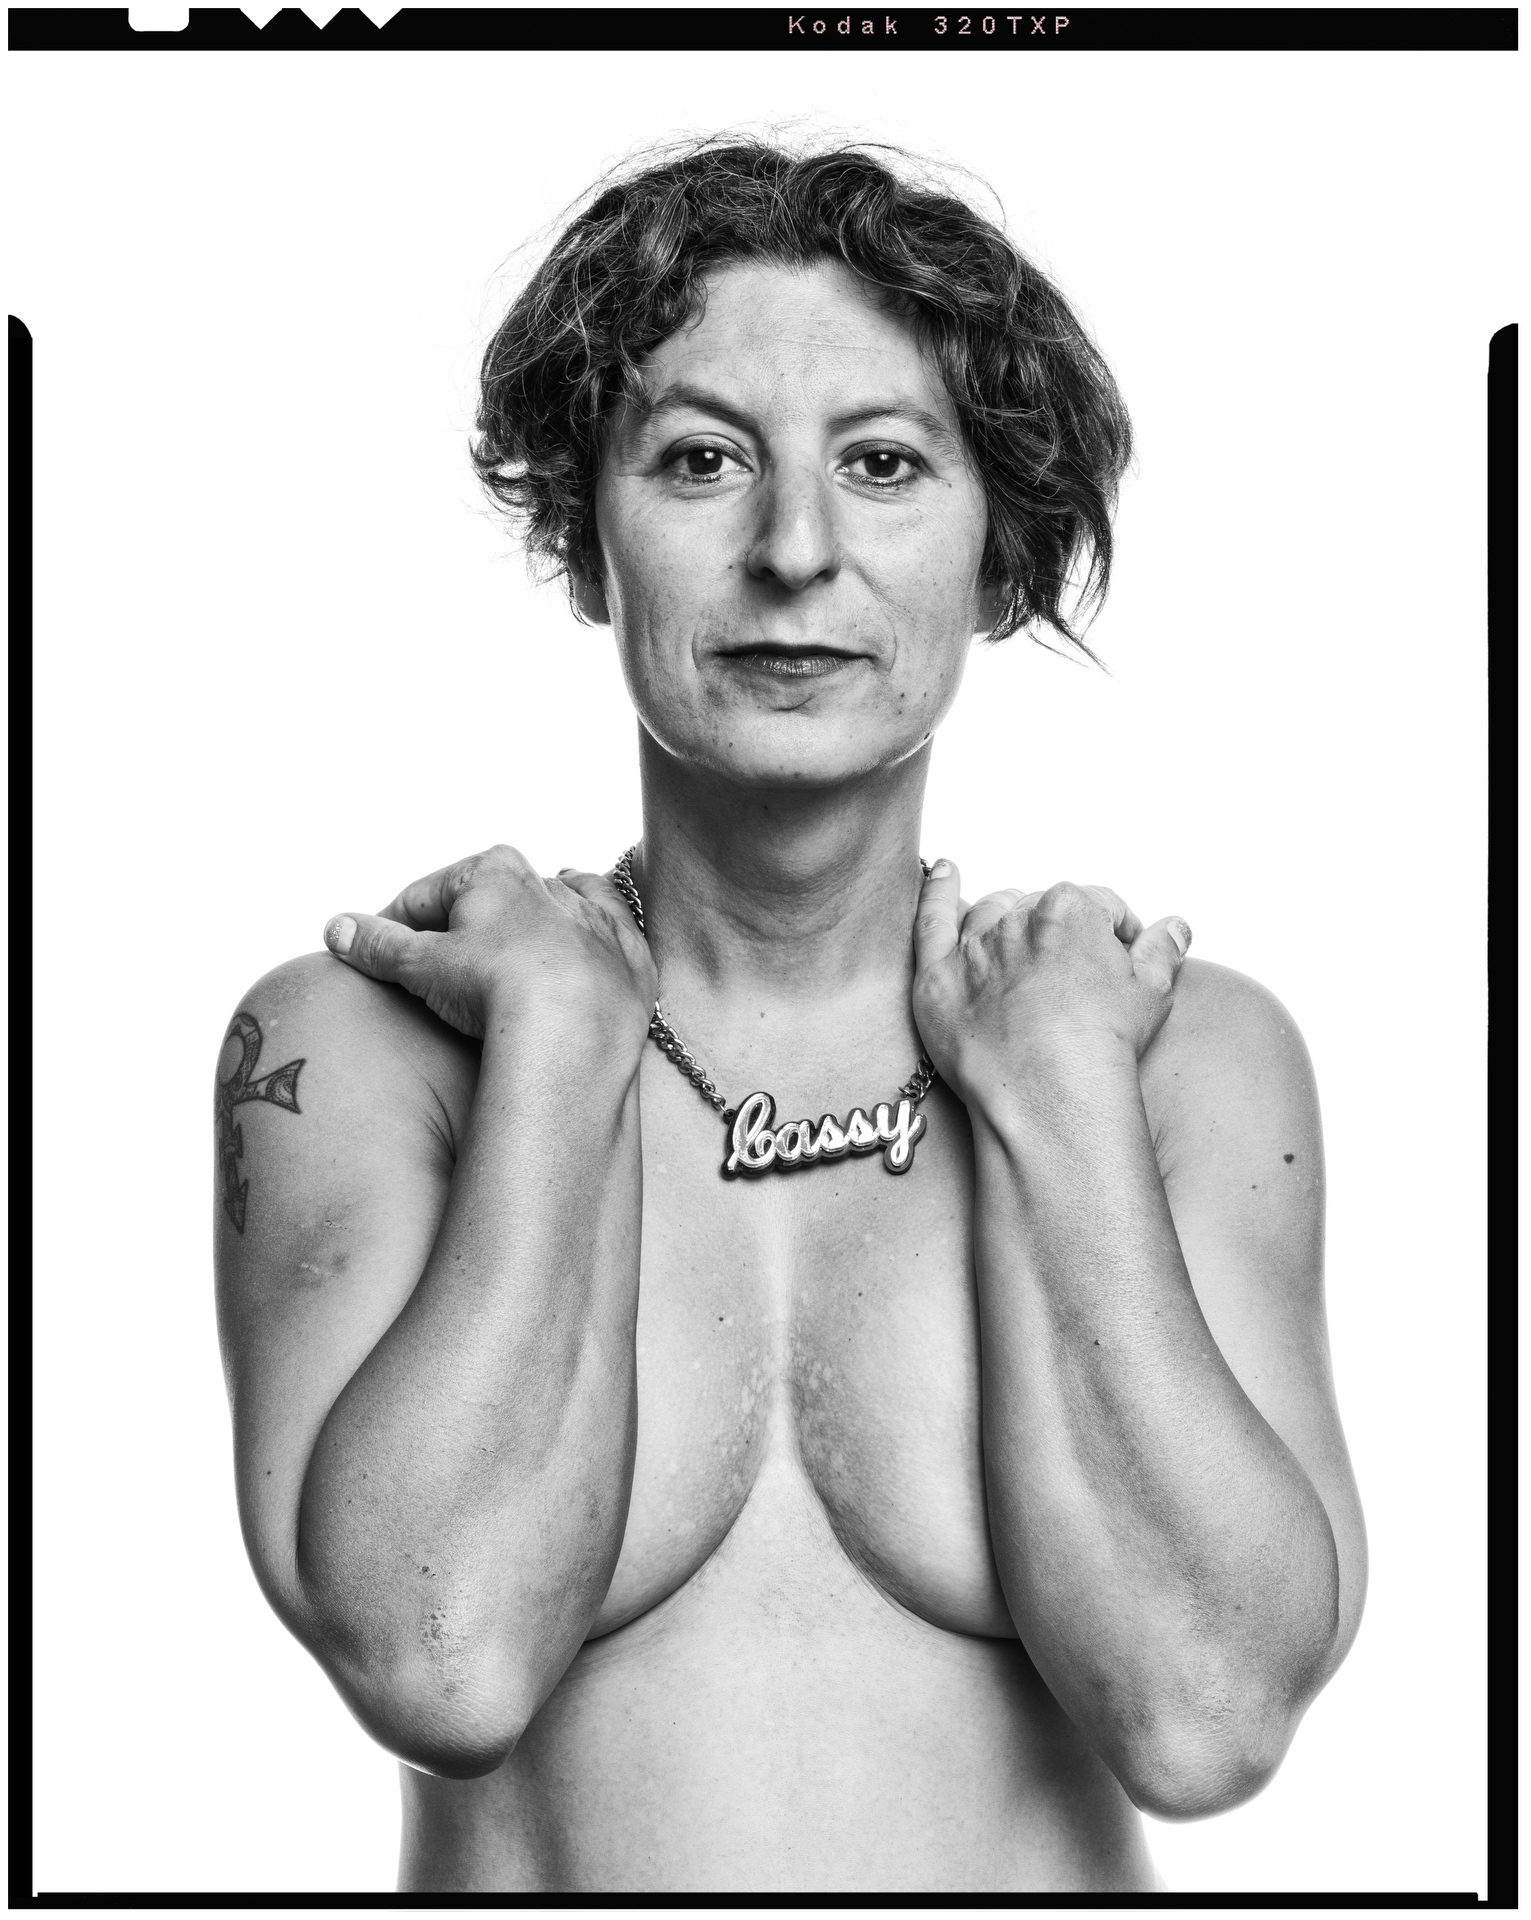 Sydney portrait photographer, corporate portraits, headshots, personal branding, portraits, I am who I am, award winning, business portraits, transgender, film photography